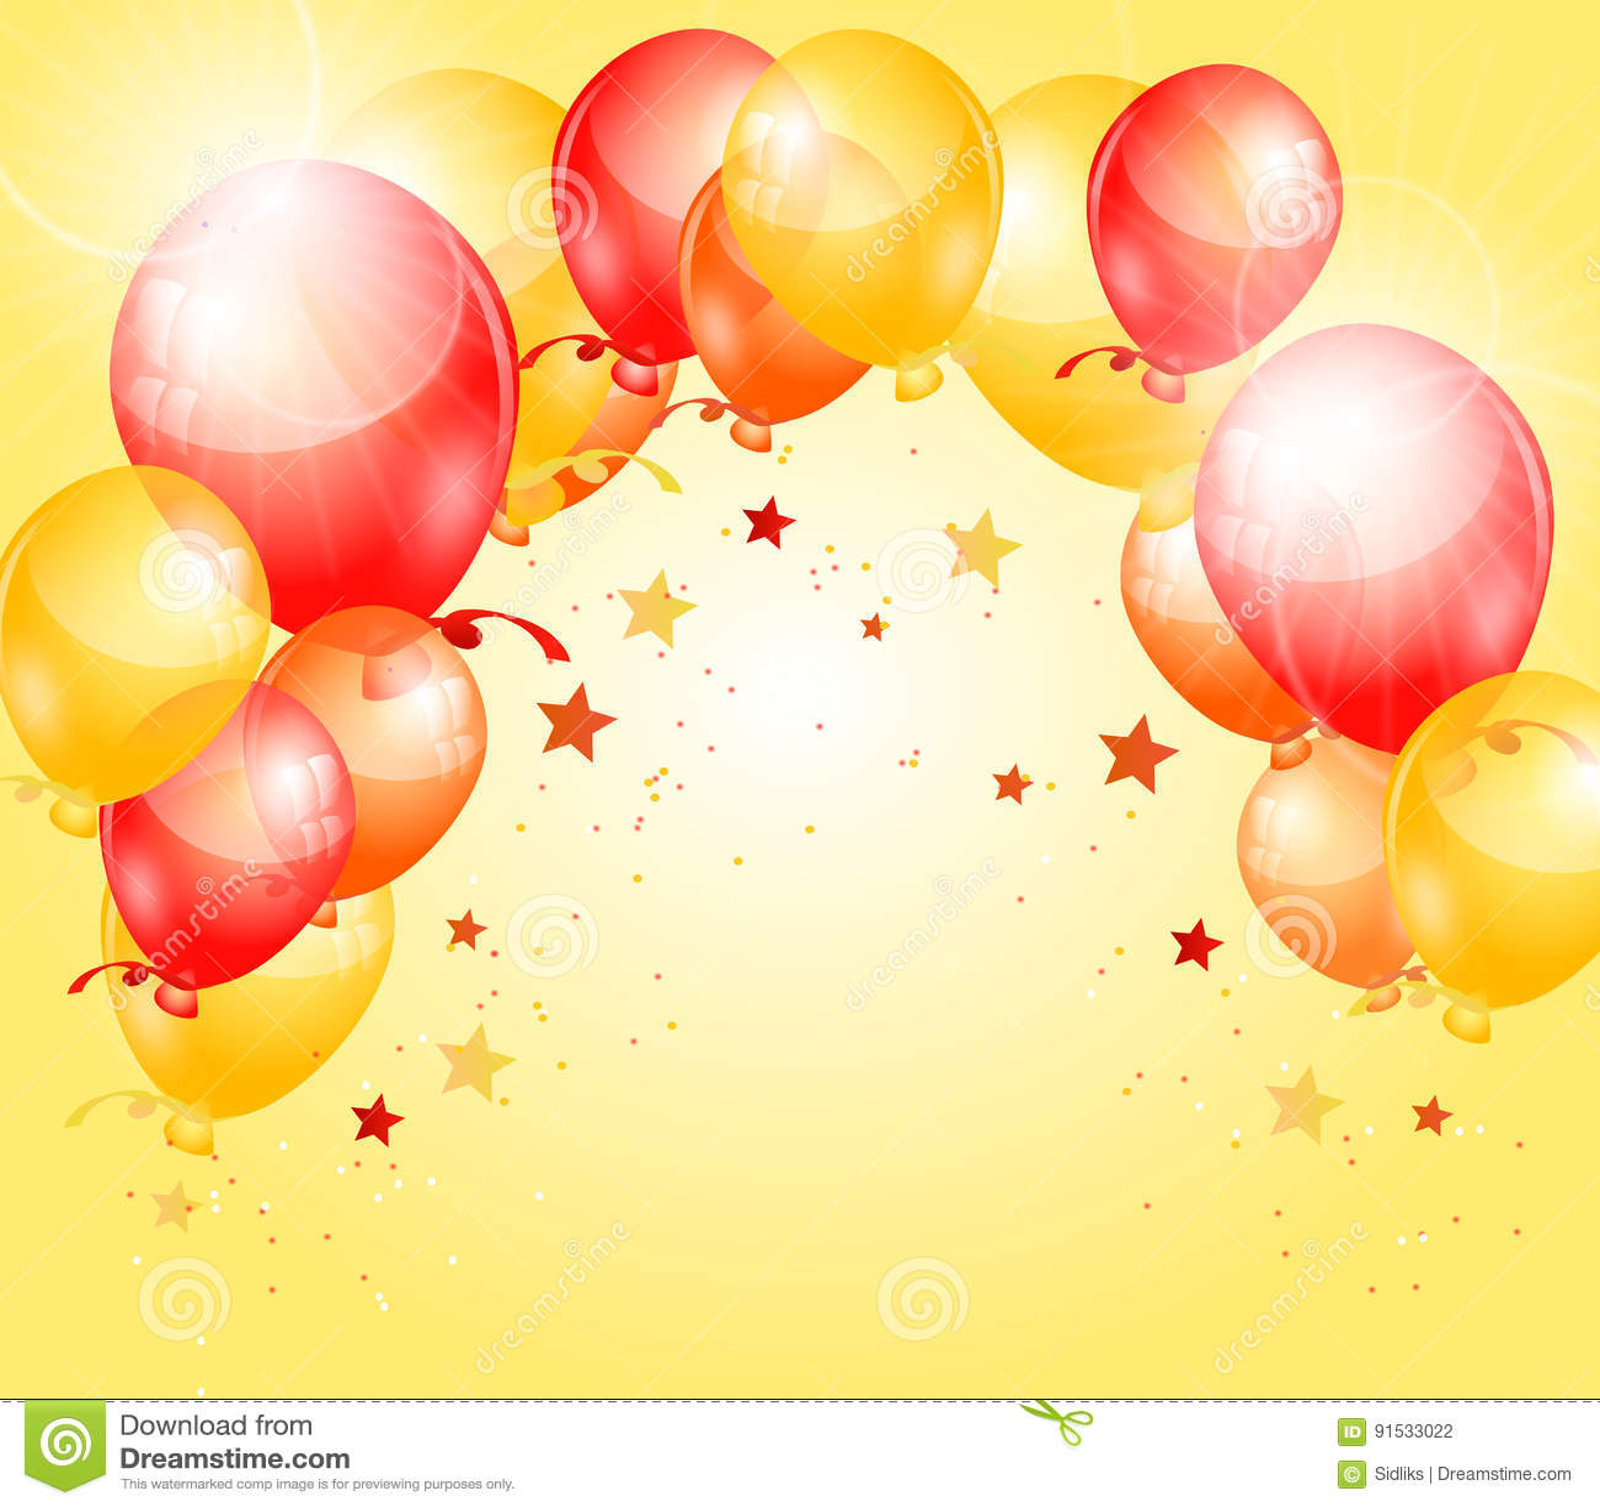 Yellow Red Birthday Background Stock Illustration